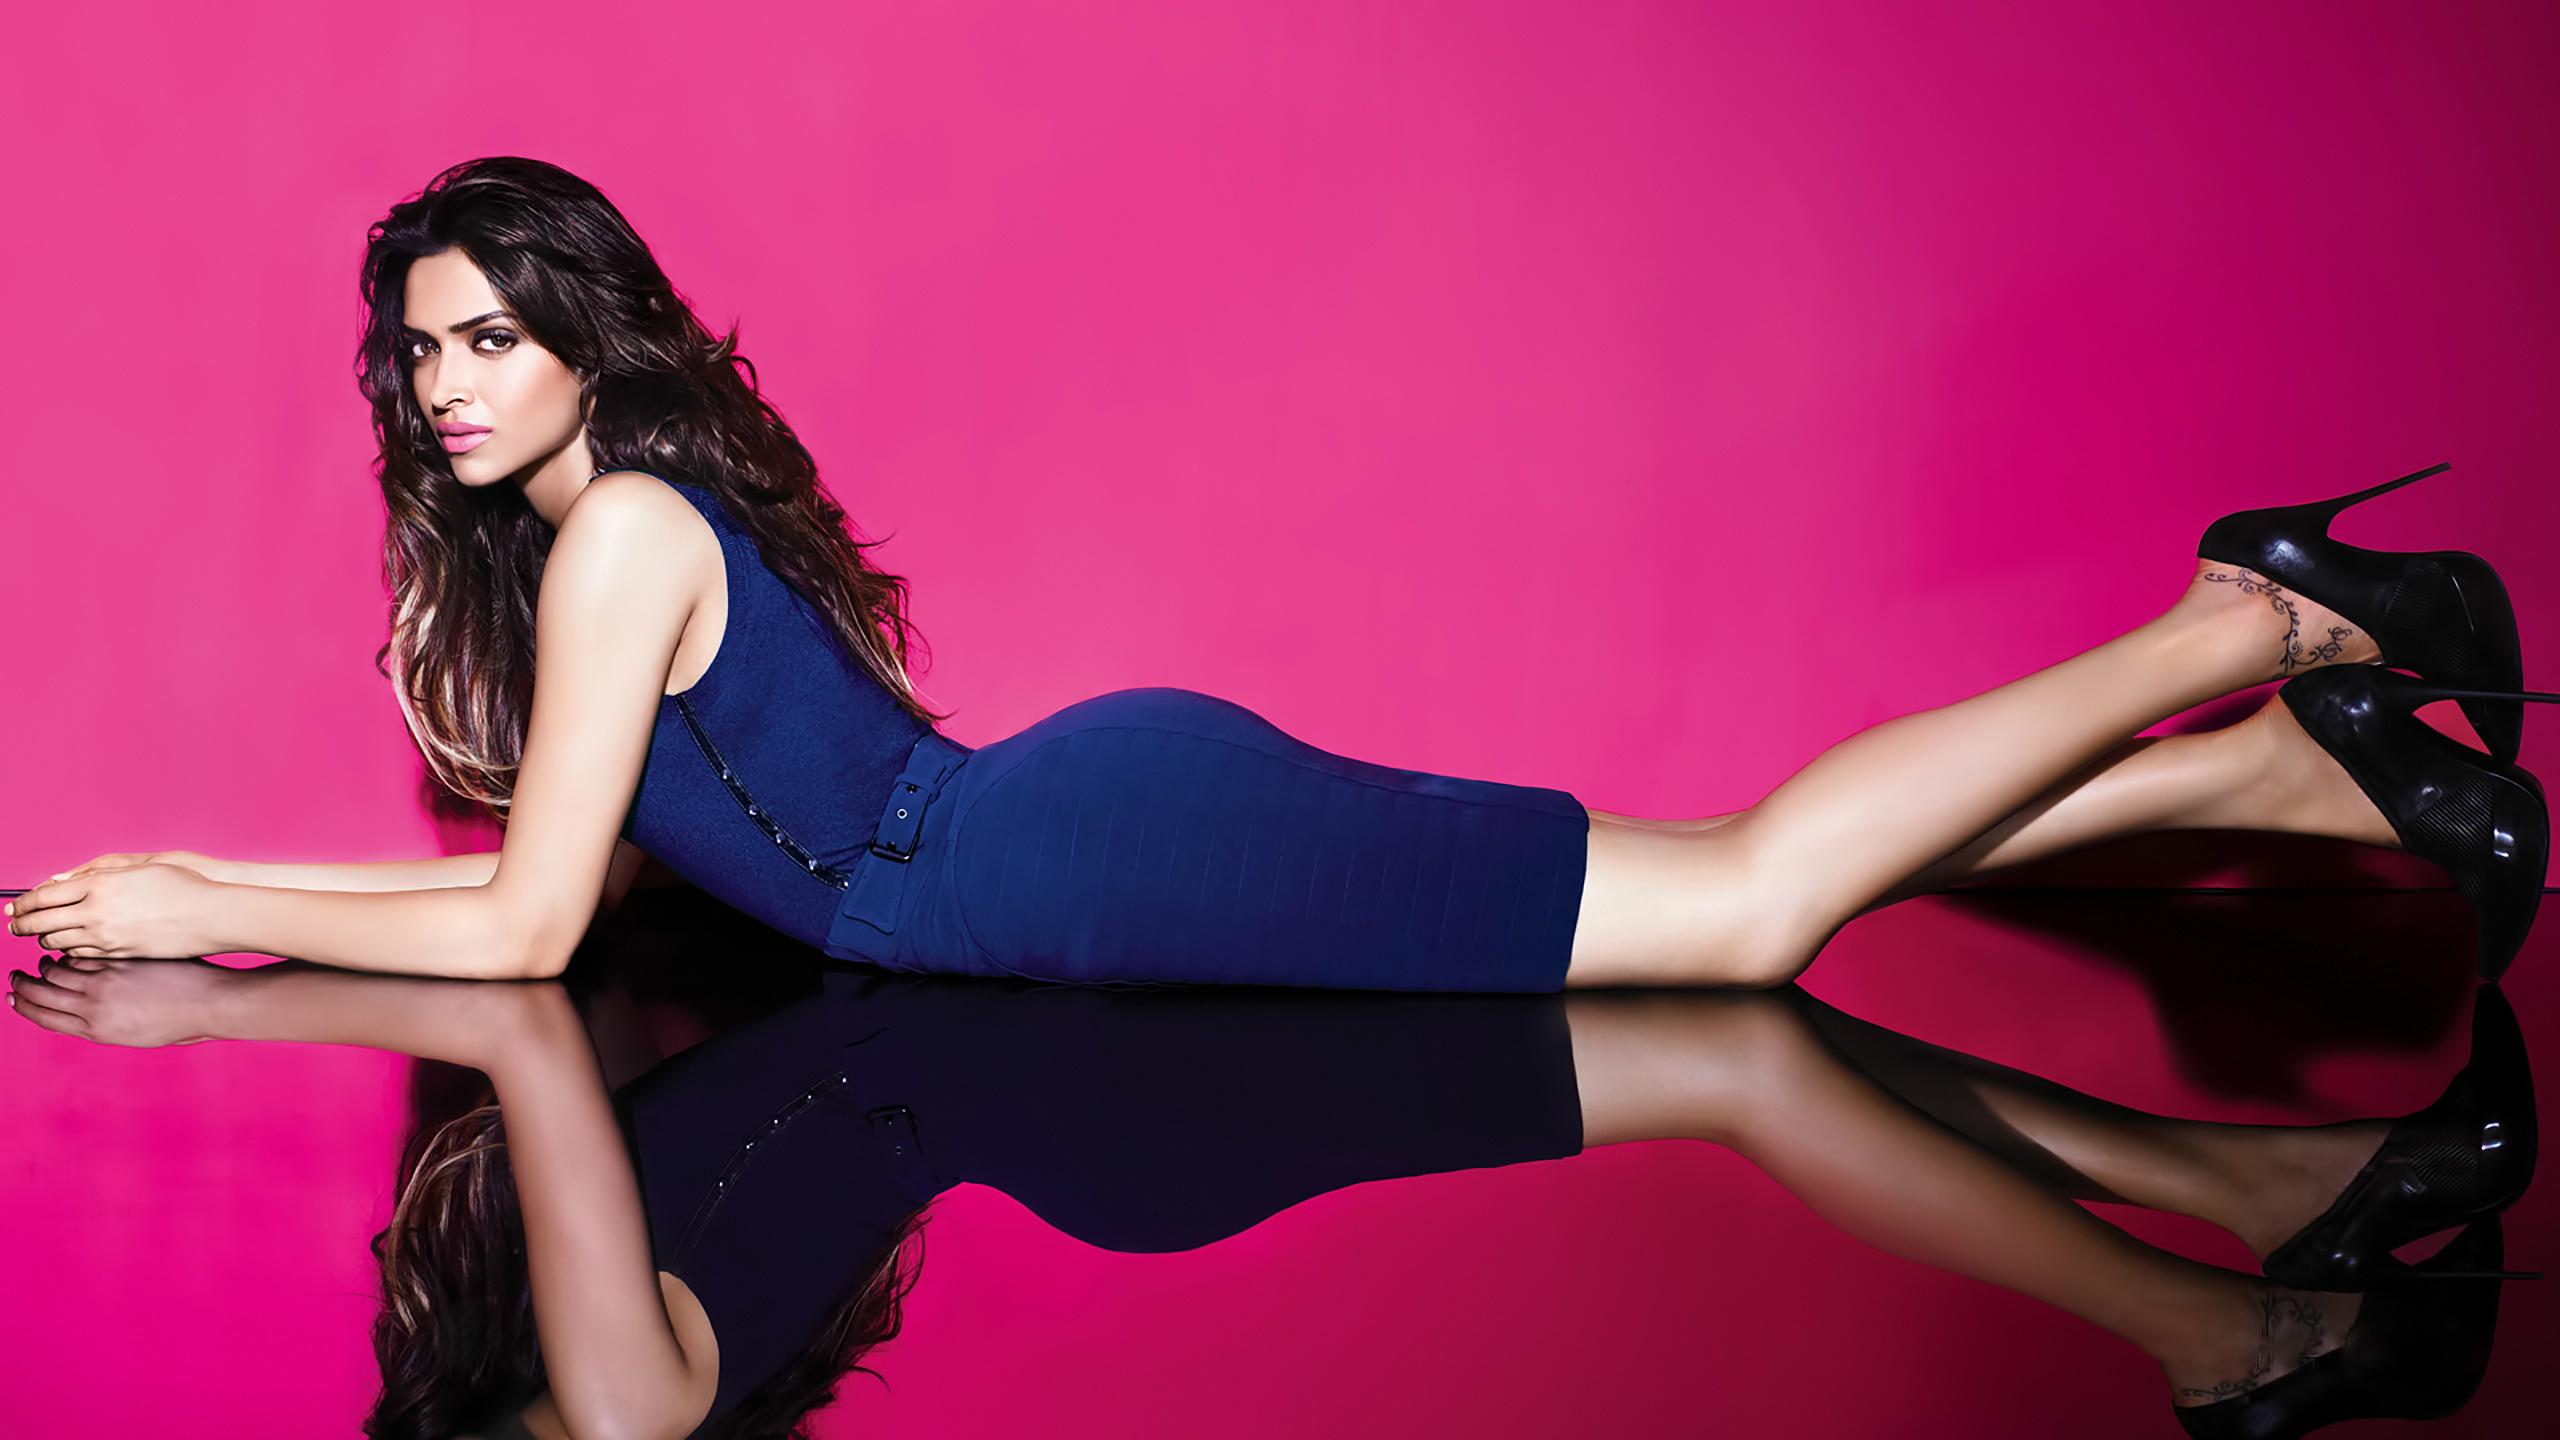 Deepika Padukone 2016 HD, HD Indian Celebrities, 4k